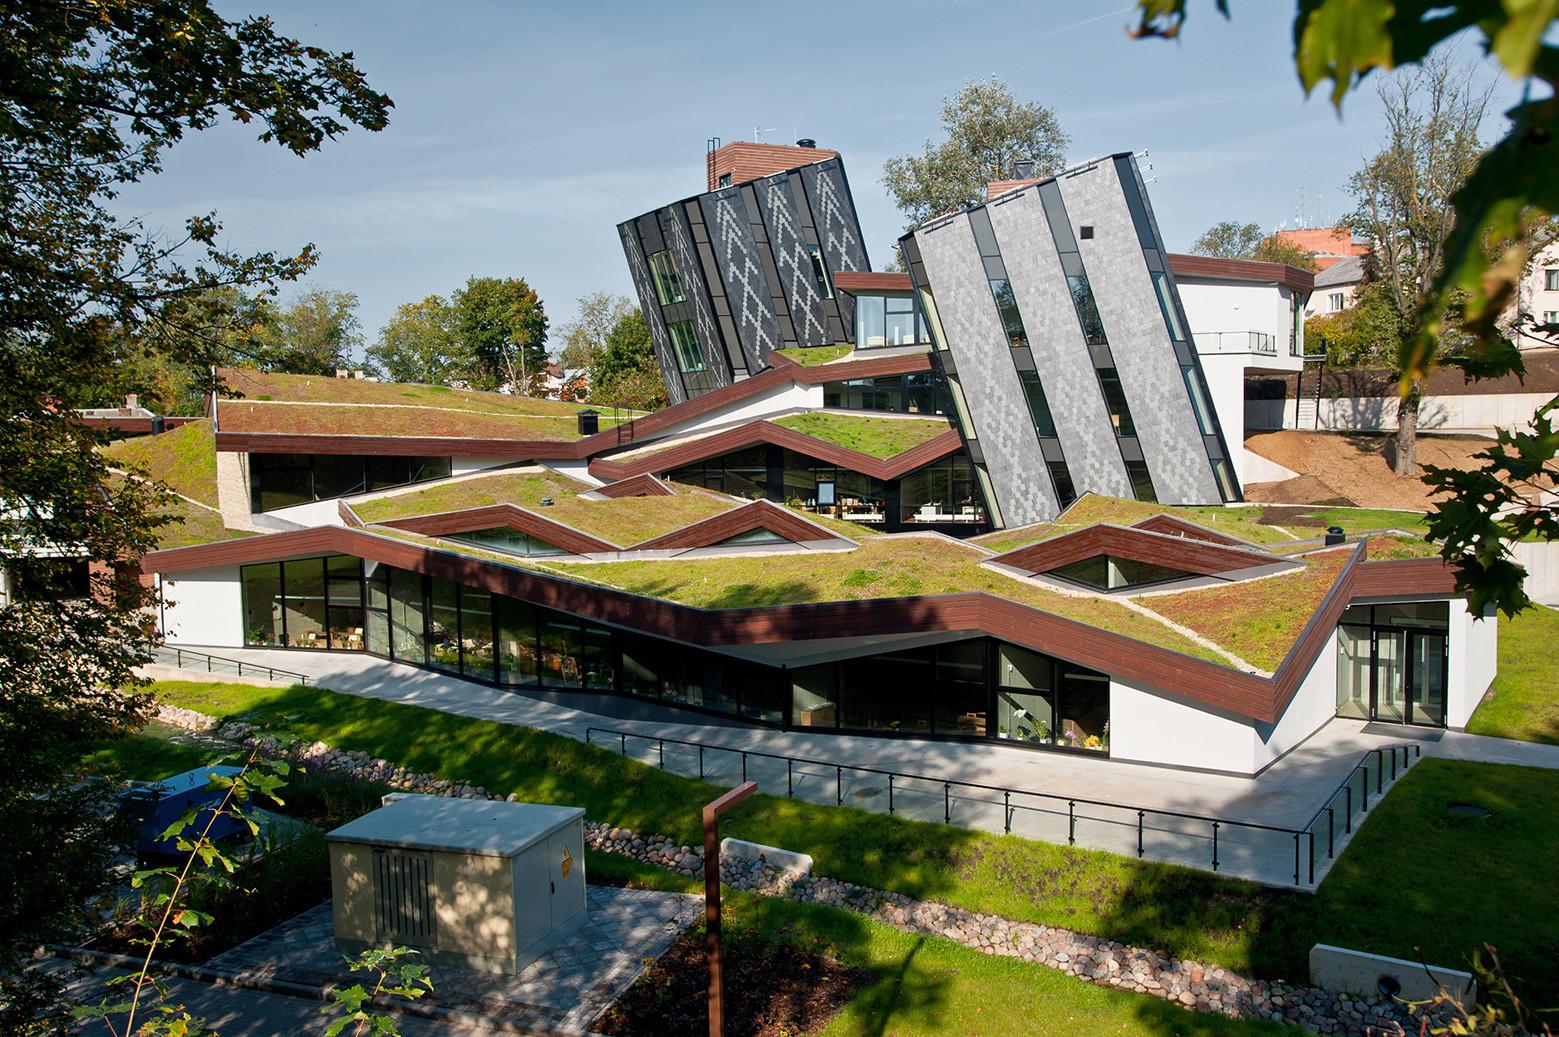 Zeimuls, Centro de servicio creativos de Latvia oriental / SAALS Architecture, © Jevgenij Nikitin, Janis Mickevics, Ingus Bajars